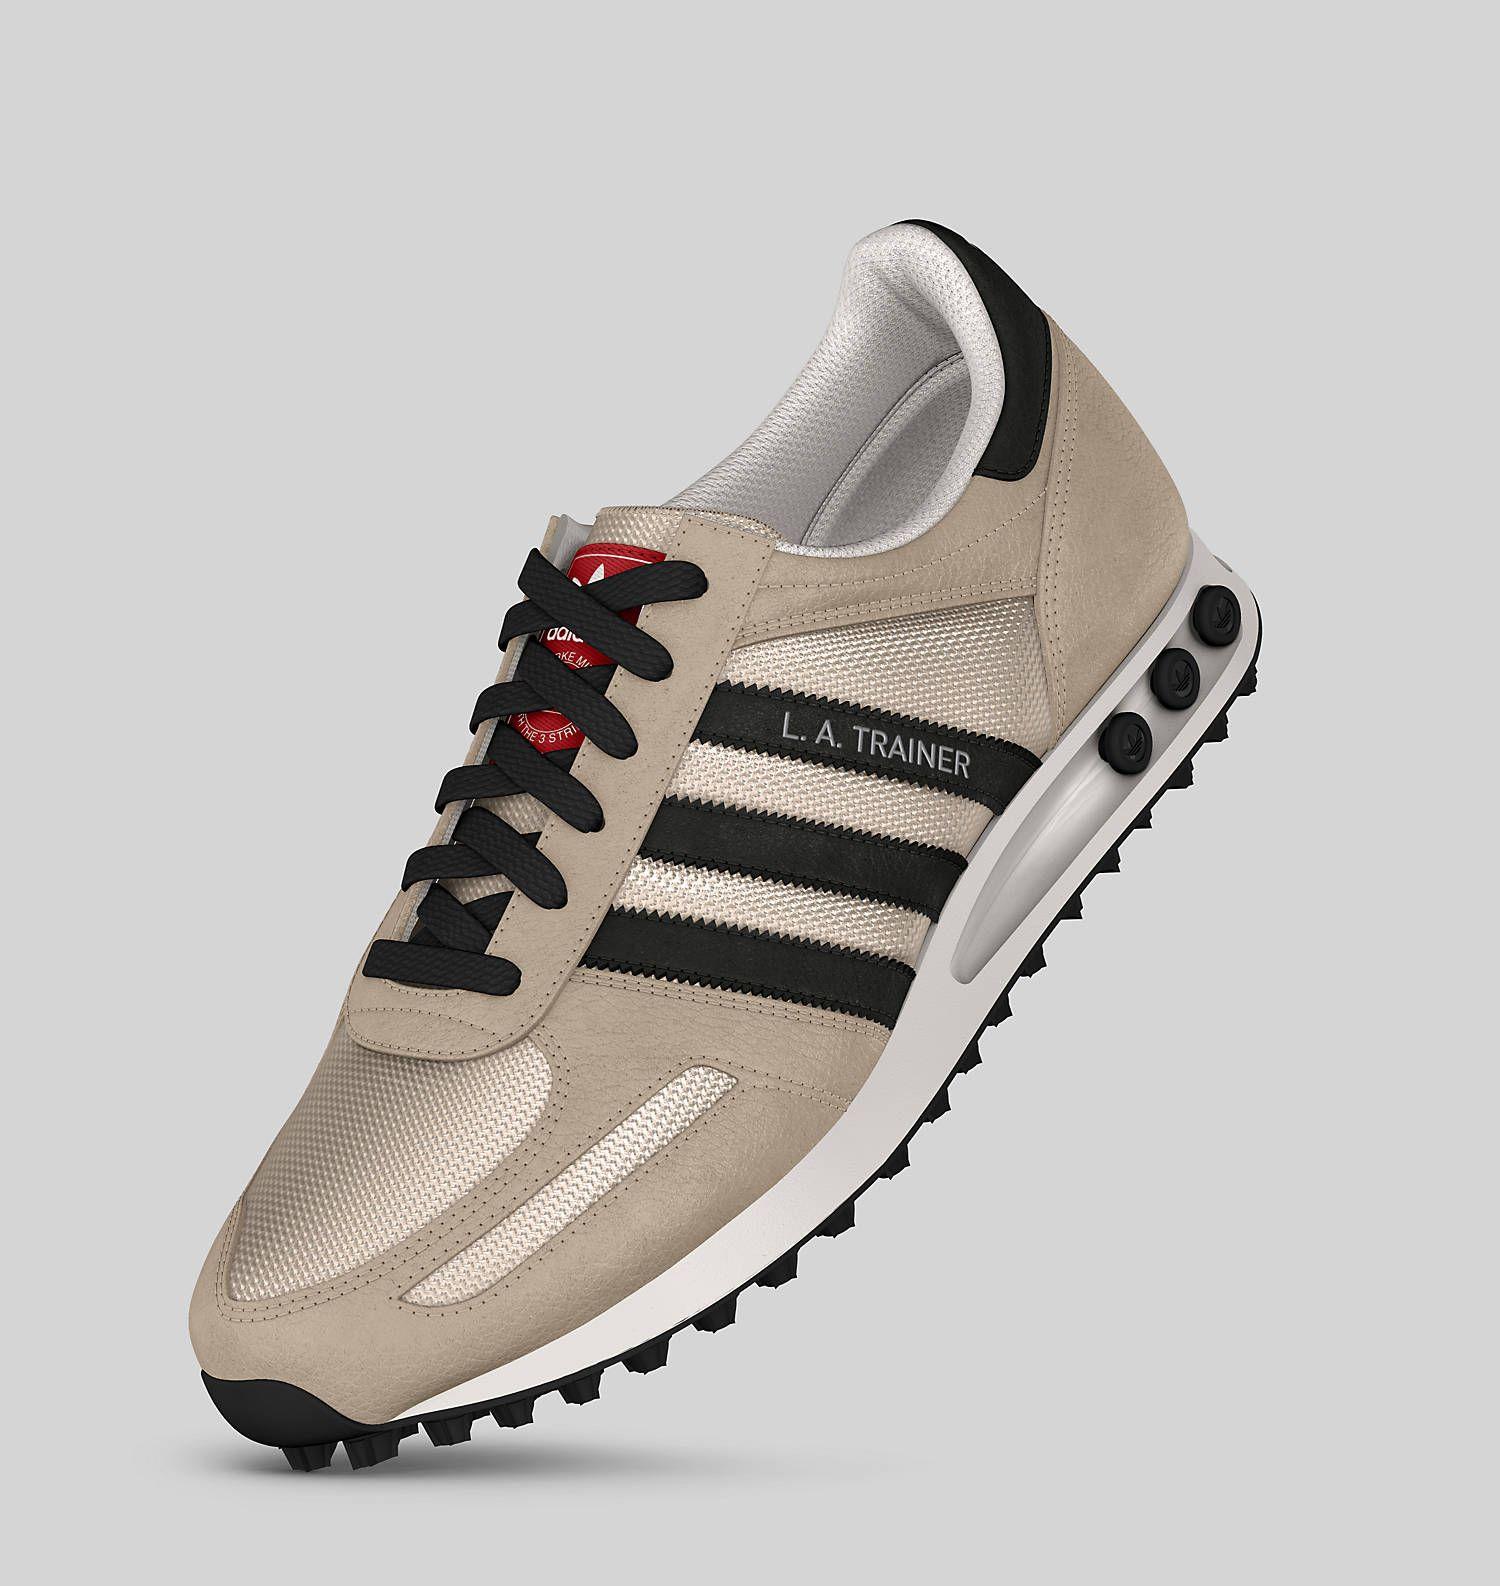 finest selection b0a75 98530 mi LA Trainer Classic  adidas - Mach dein eigenes Design -